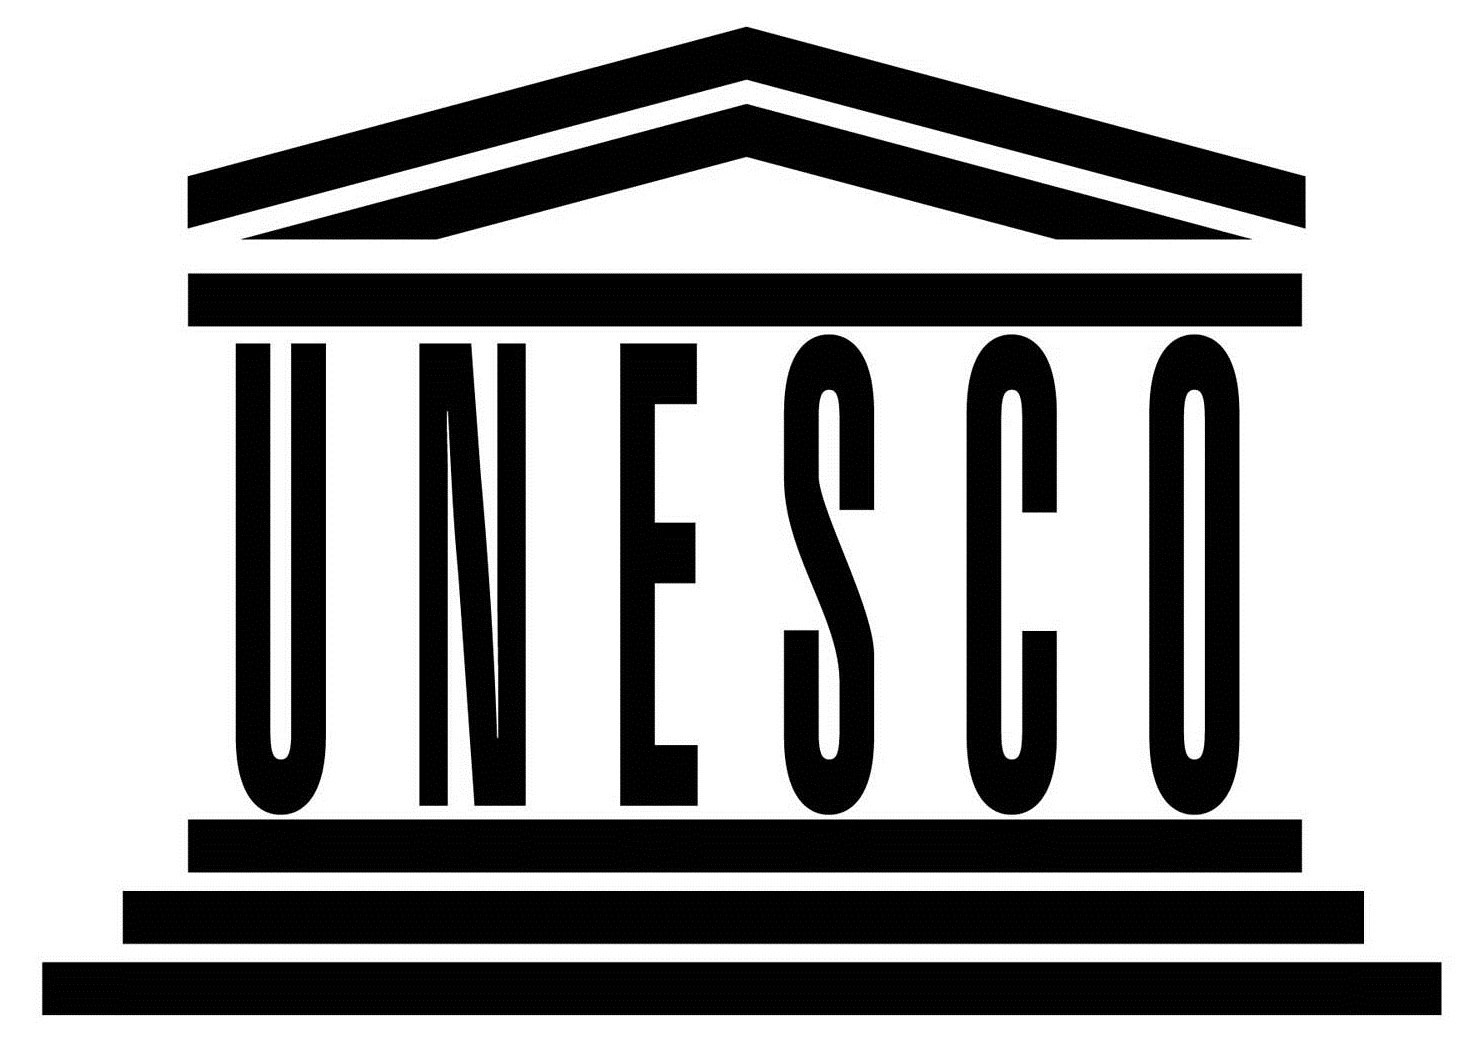 UNESCO.jpeg